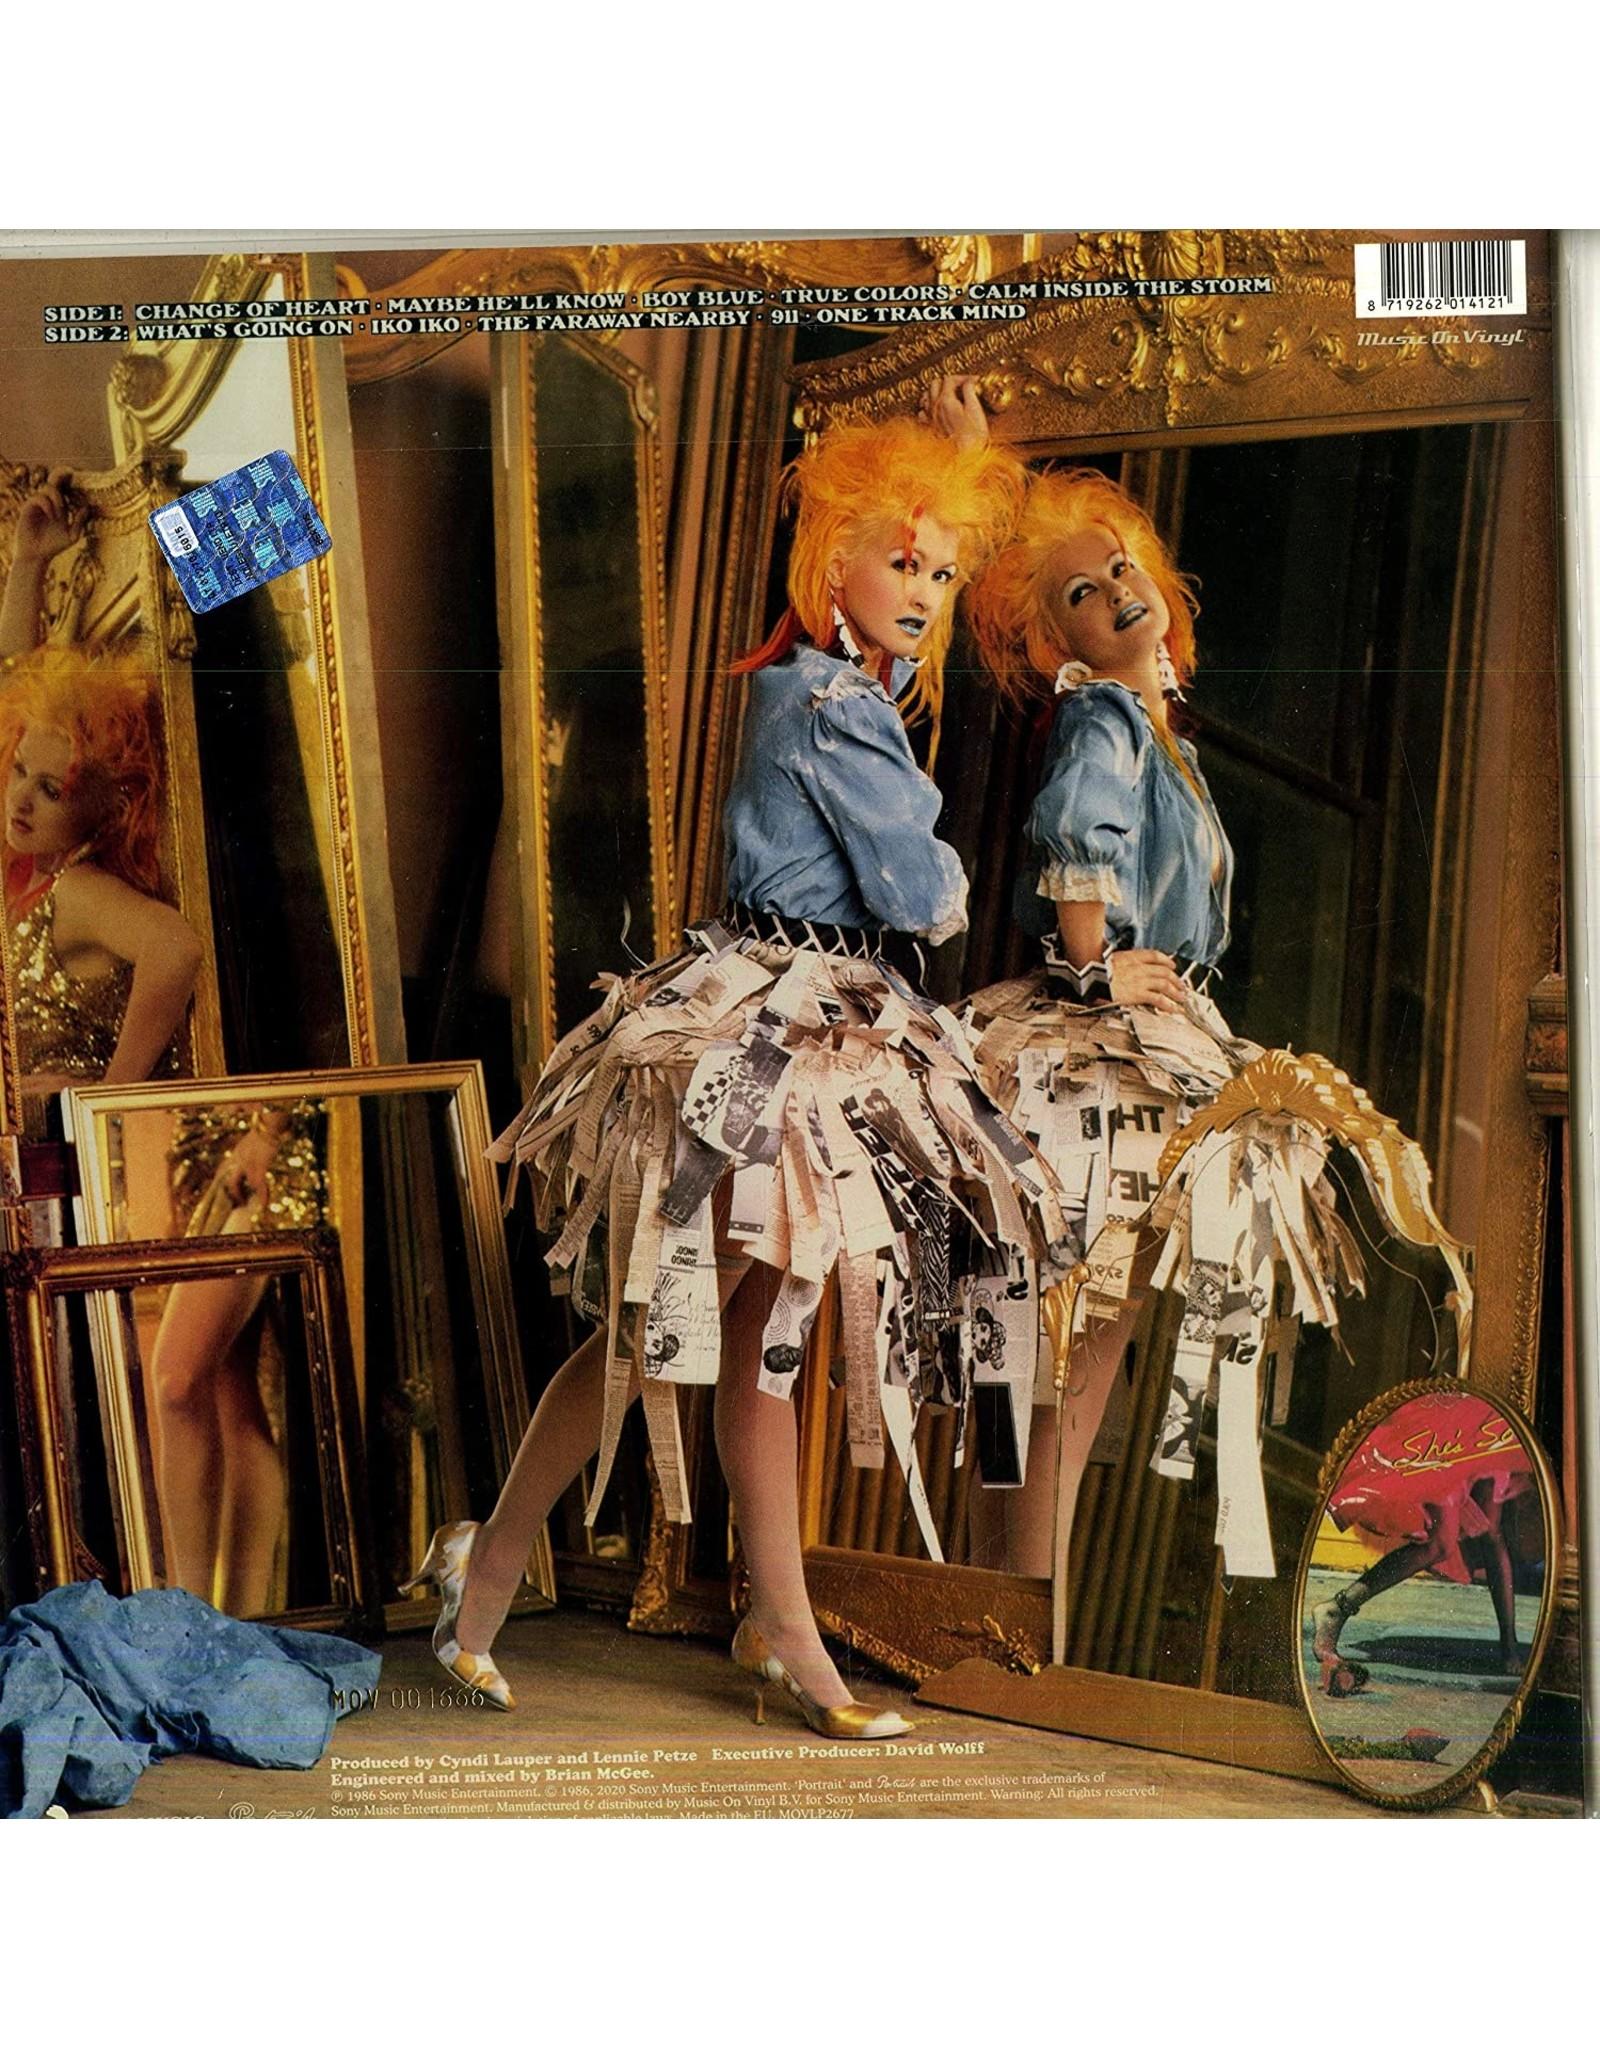 Cyndi Lauper - True Colors (Music On Vinyl) [Flaming Orange Vinyl]